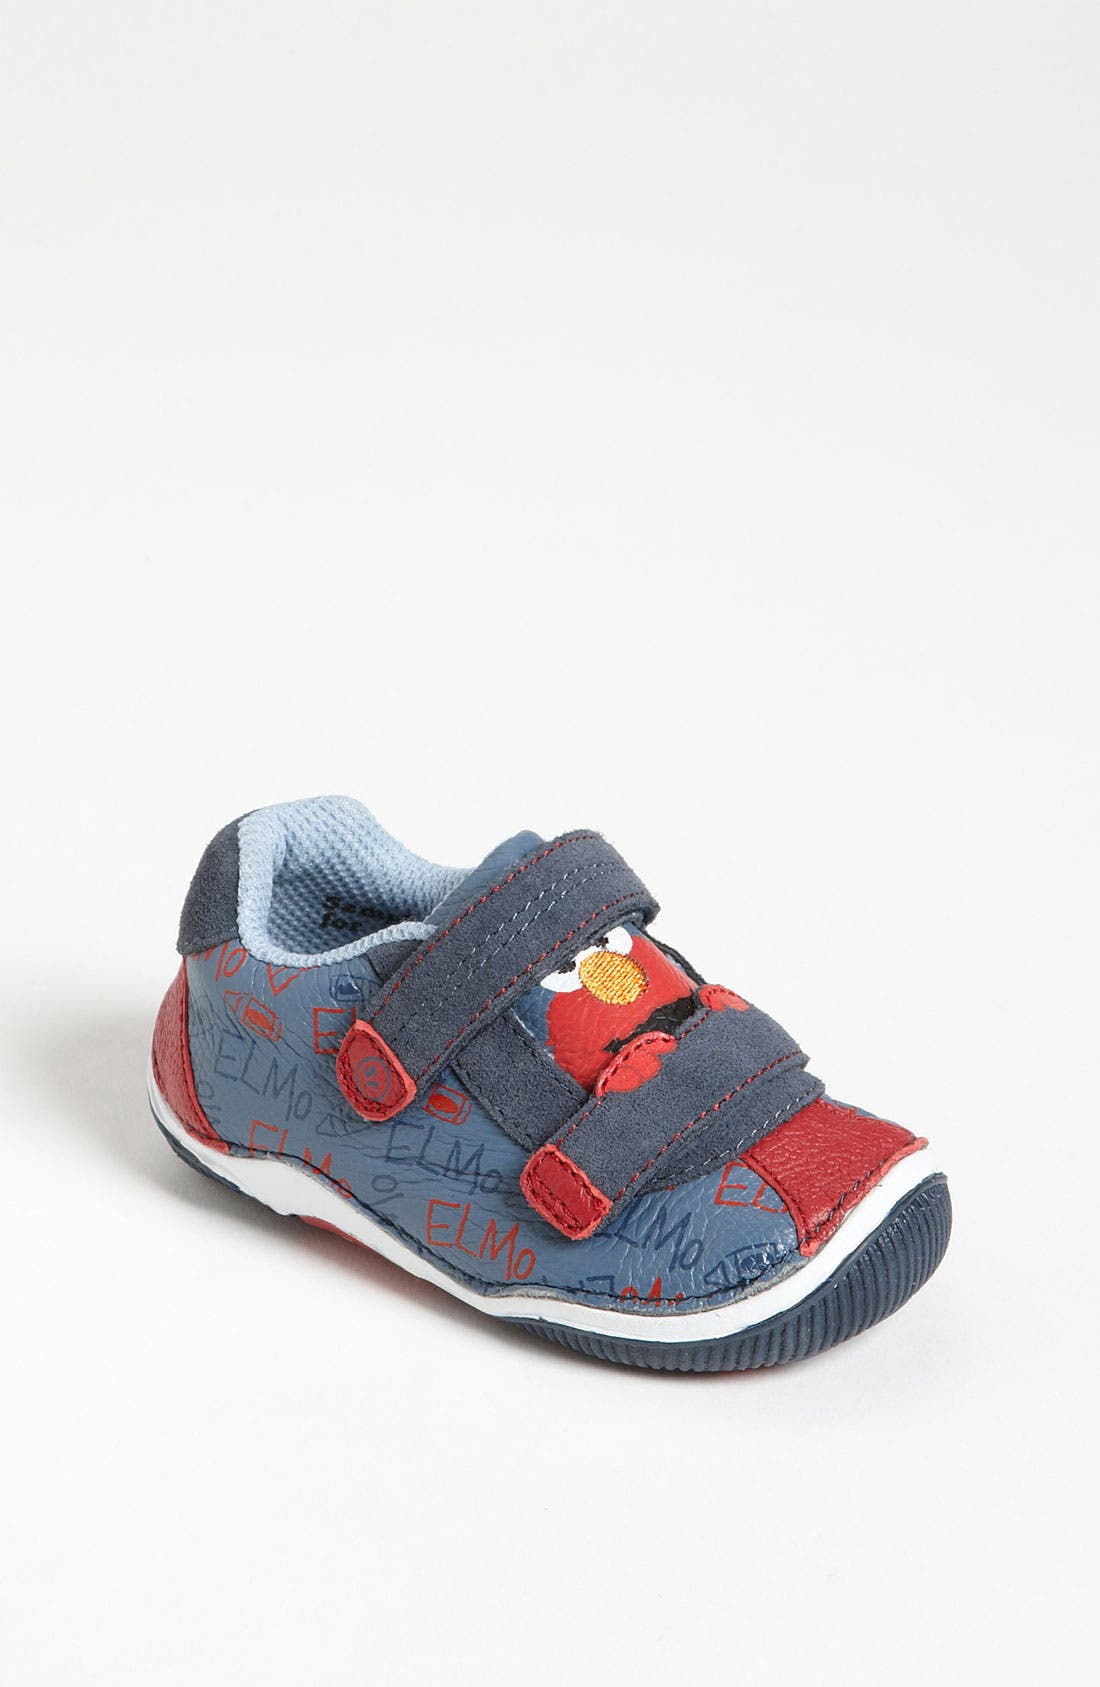 Alternate Image 1 Selected - Stride Rite 'Elmo' Sneaker (Baby, Walker & Toddler)